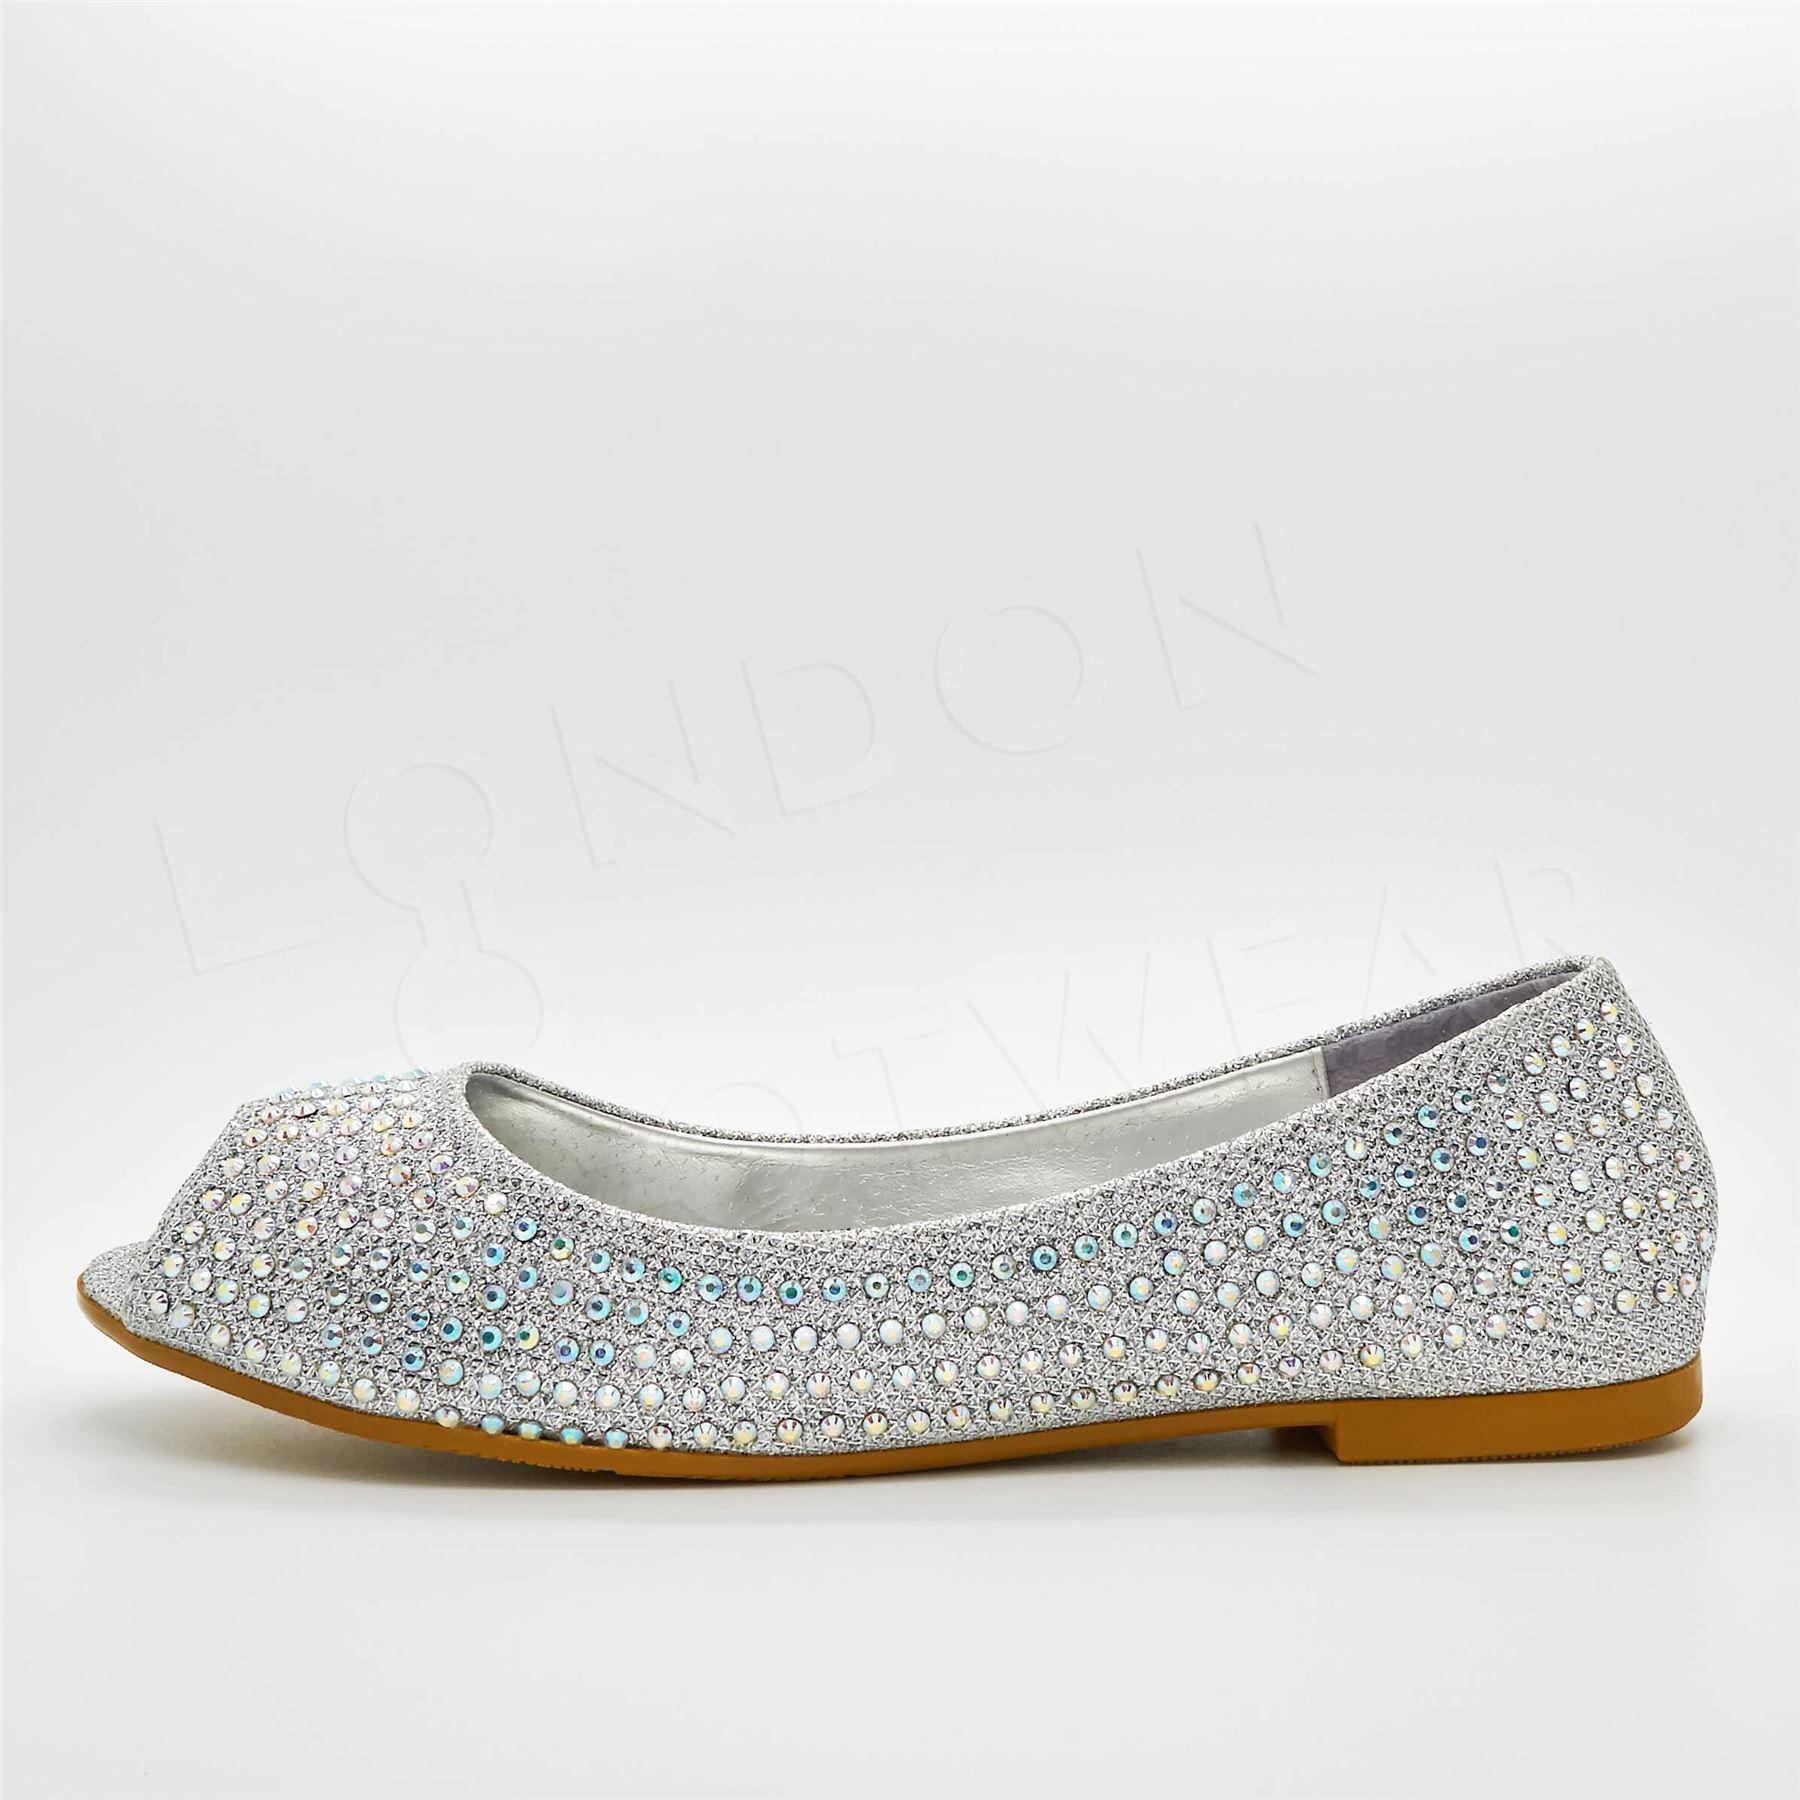 New Womens Diamante Ballet Flats Peep Toe Pumps Ladies Ballerinas Dolly Shoes UK | EBay